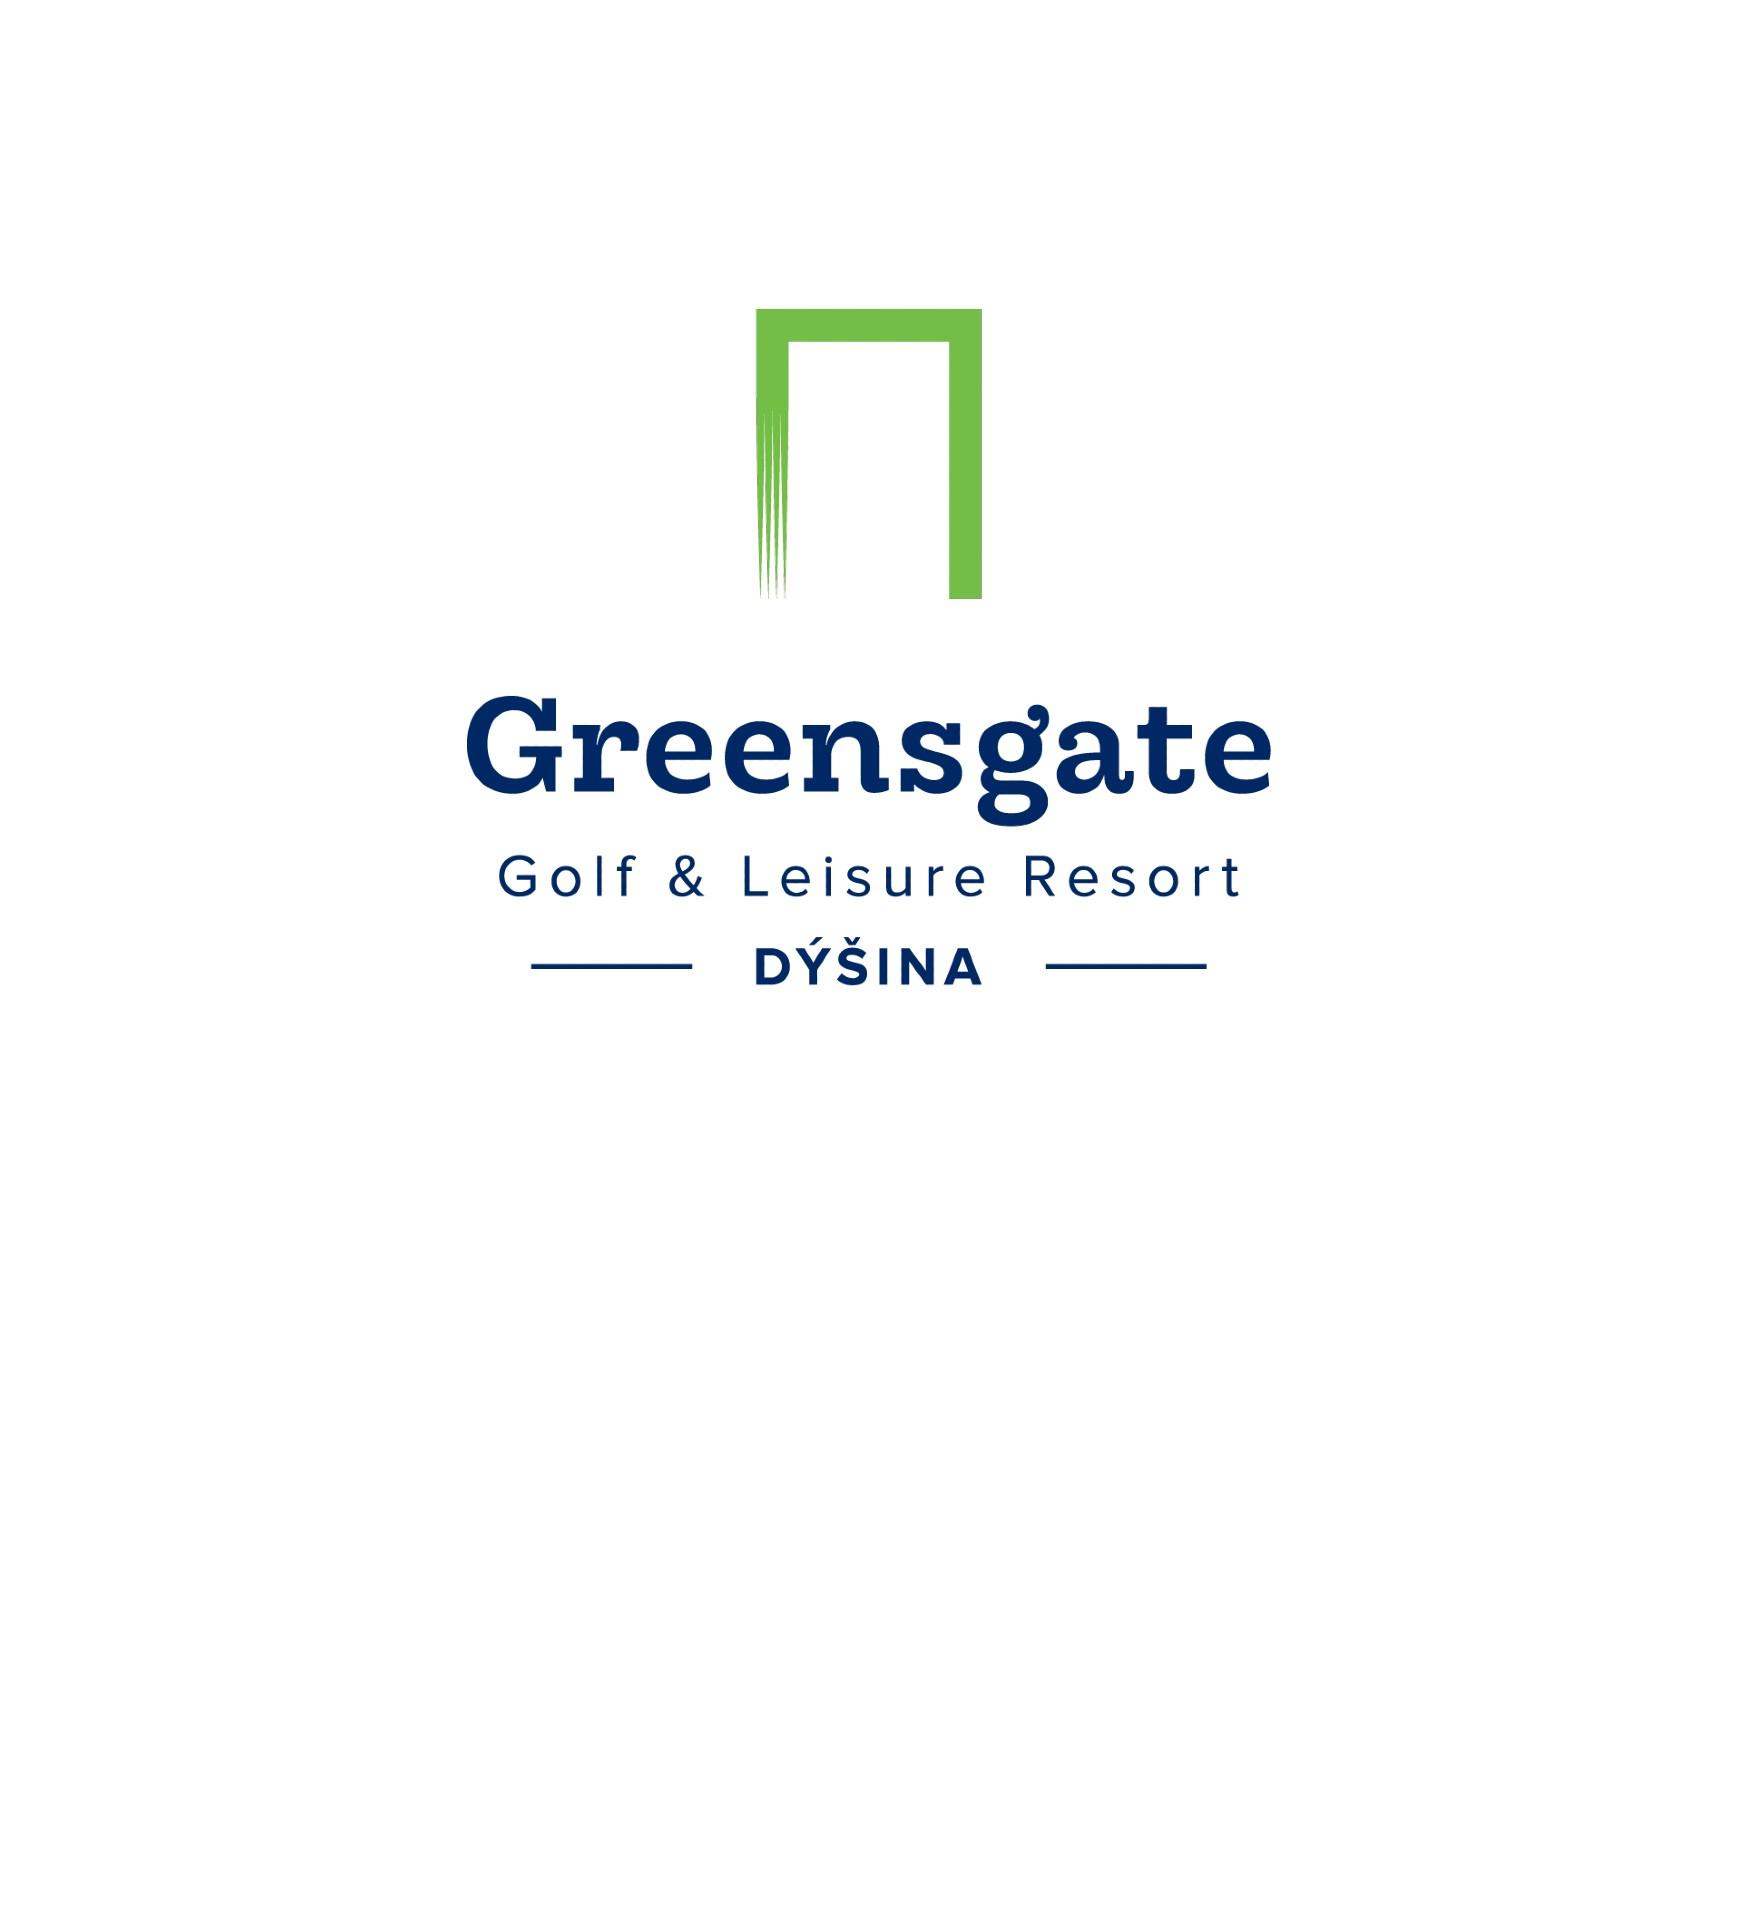 Greensgate_logo